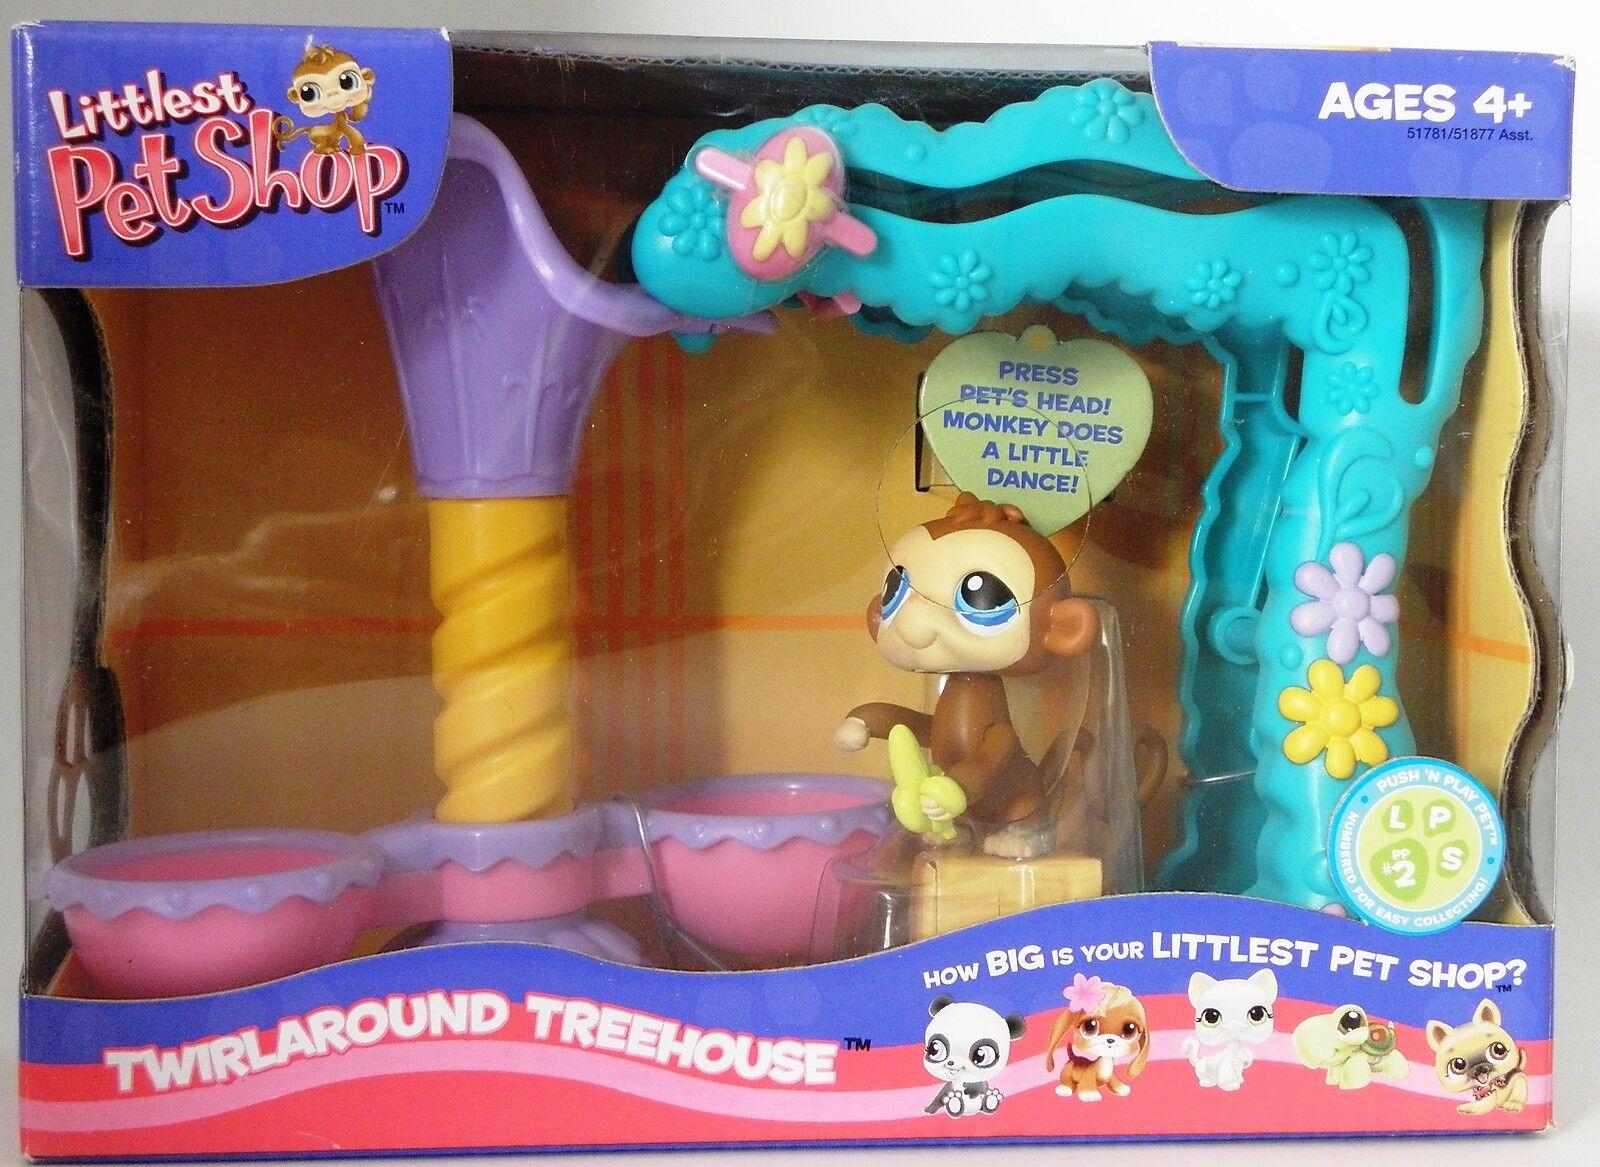 Littlest Littlest Littlest Pet Shop push 'n play Monkey twirlaround treehouse e3288f